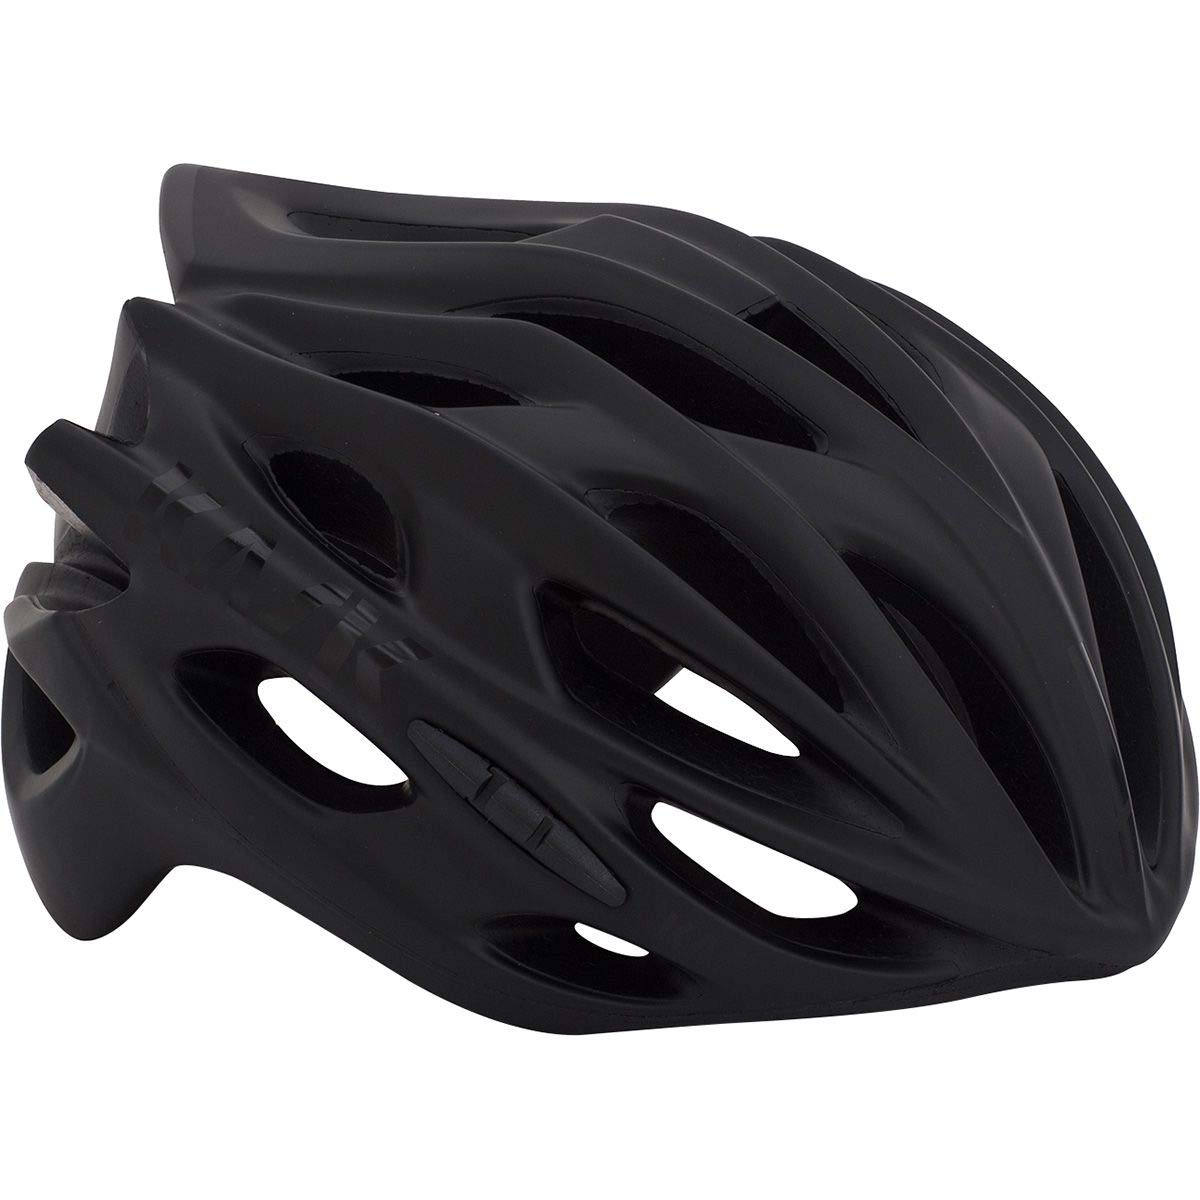 FORCE MTB-11 Men/'s Cycling//Bike Shorts Coolmax Padded Black NEW SIZE LARGE